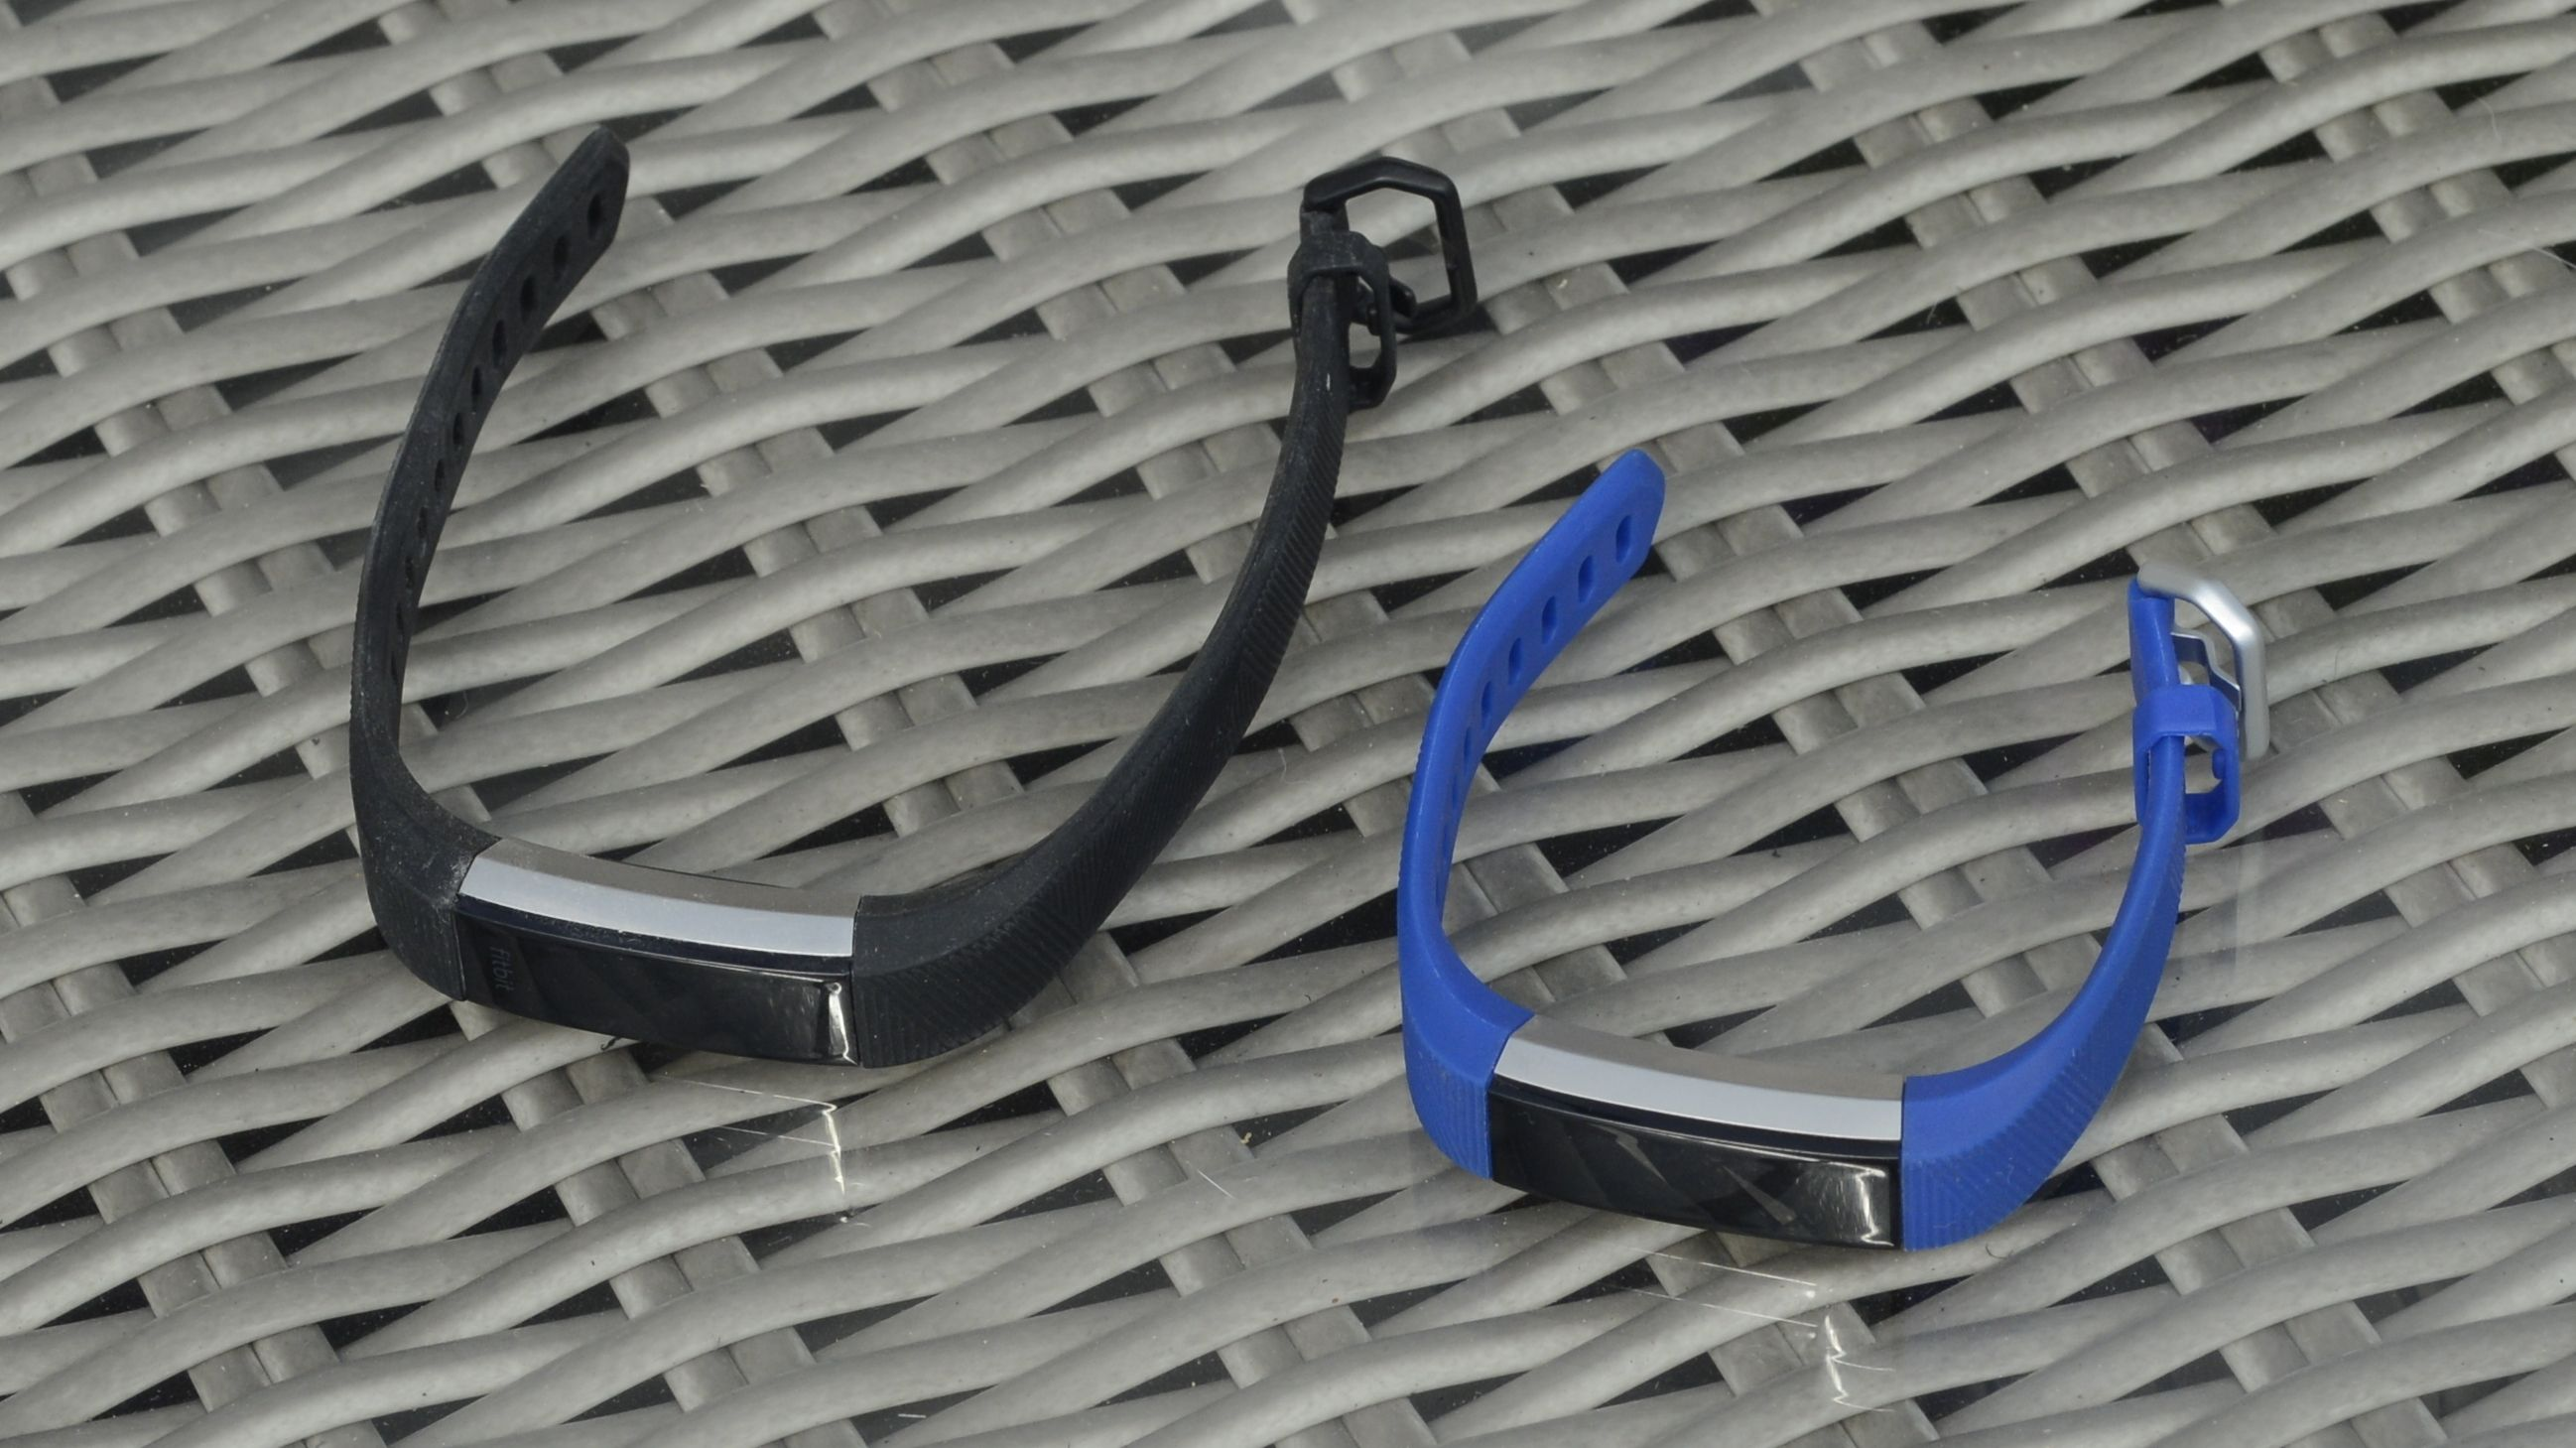 Her ser du Fitbit Alta HR til venstre og den nye Ace-modellen til høyre.